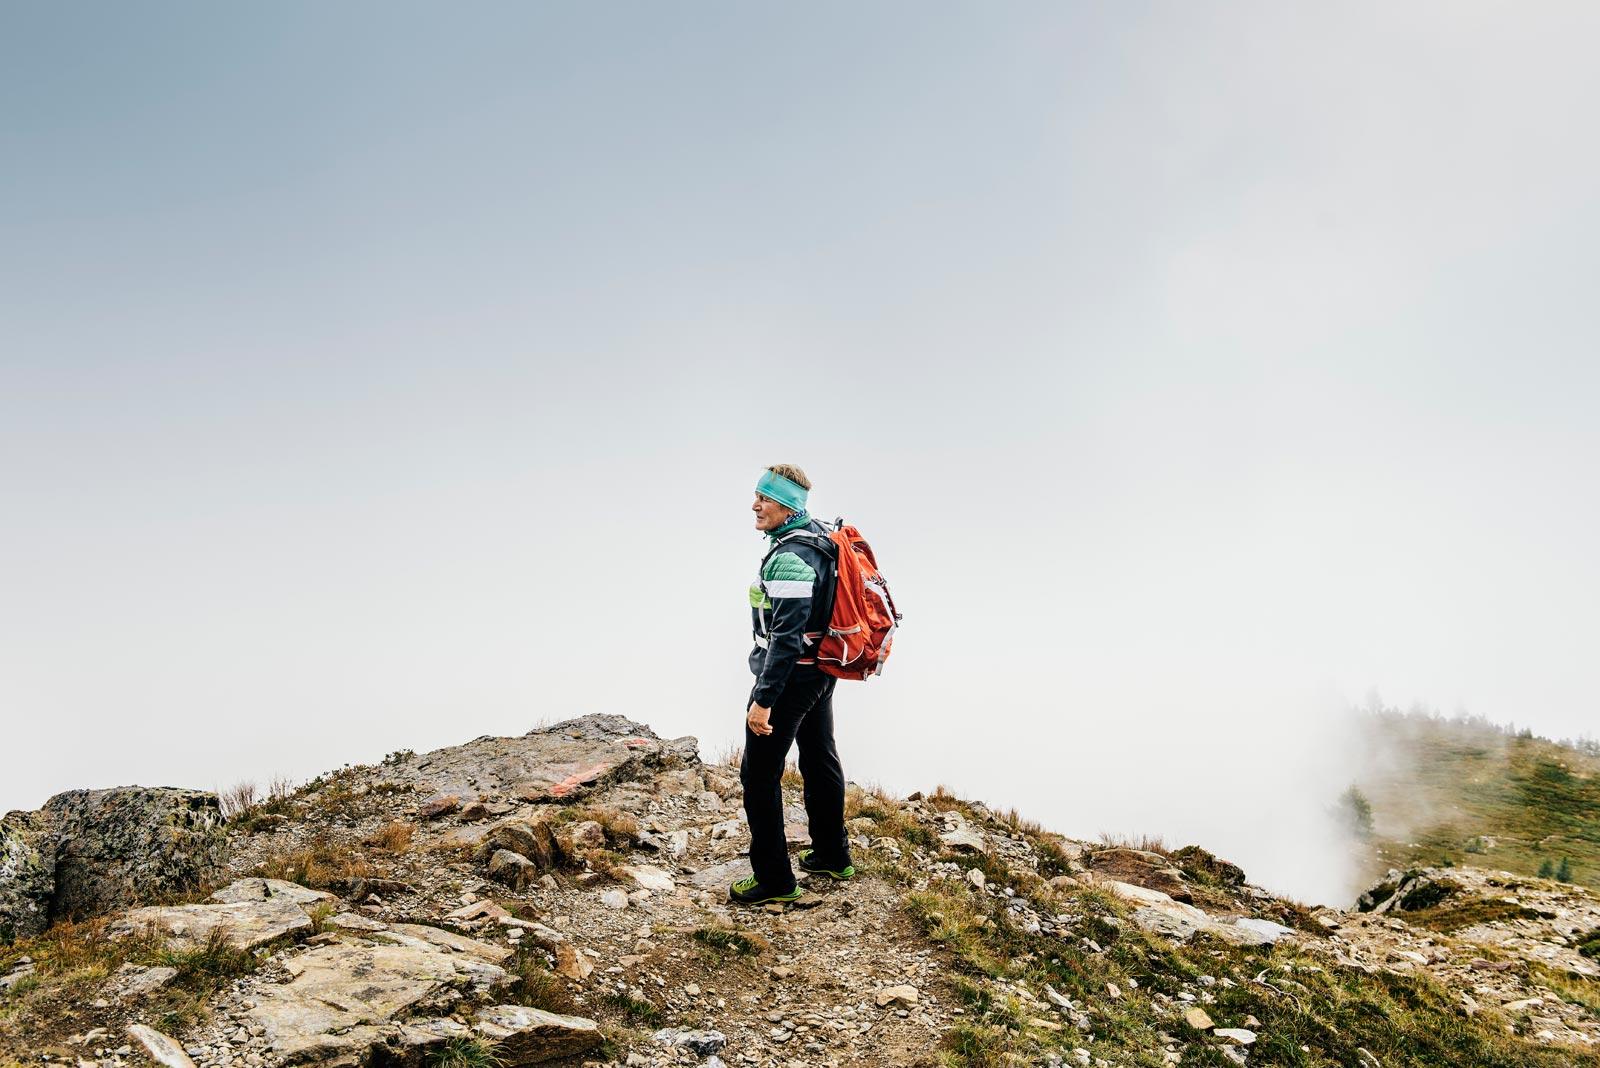 Reise, reportagefotografie, Dokumentation, portrait, Fotograf, landschaft